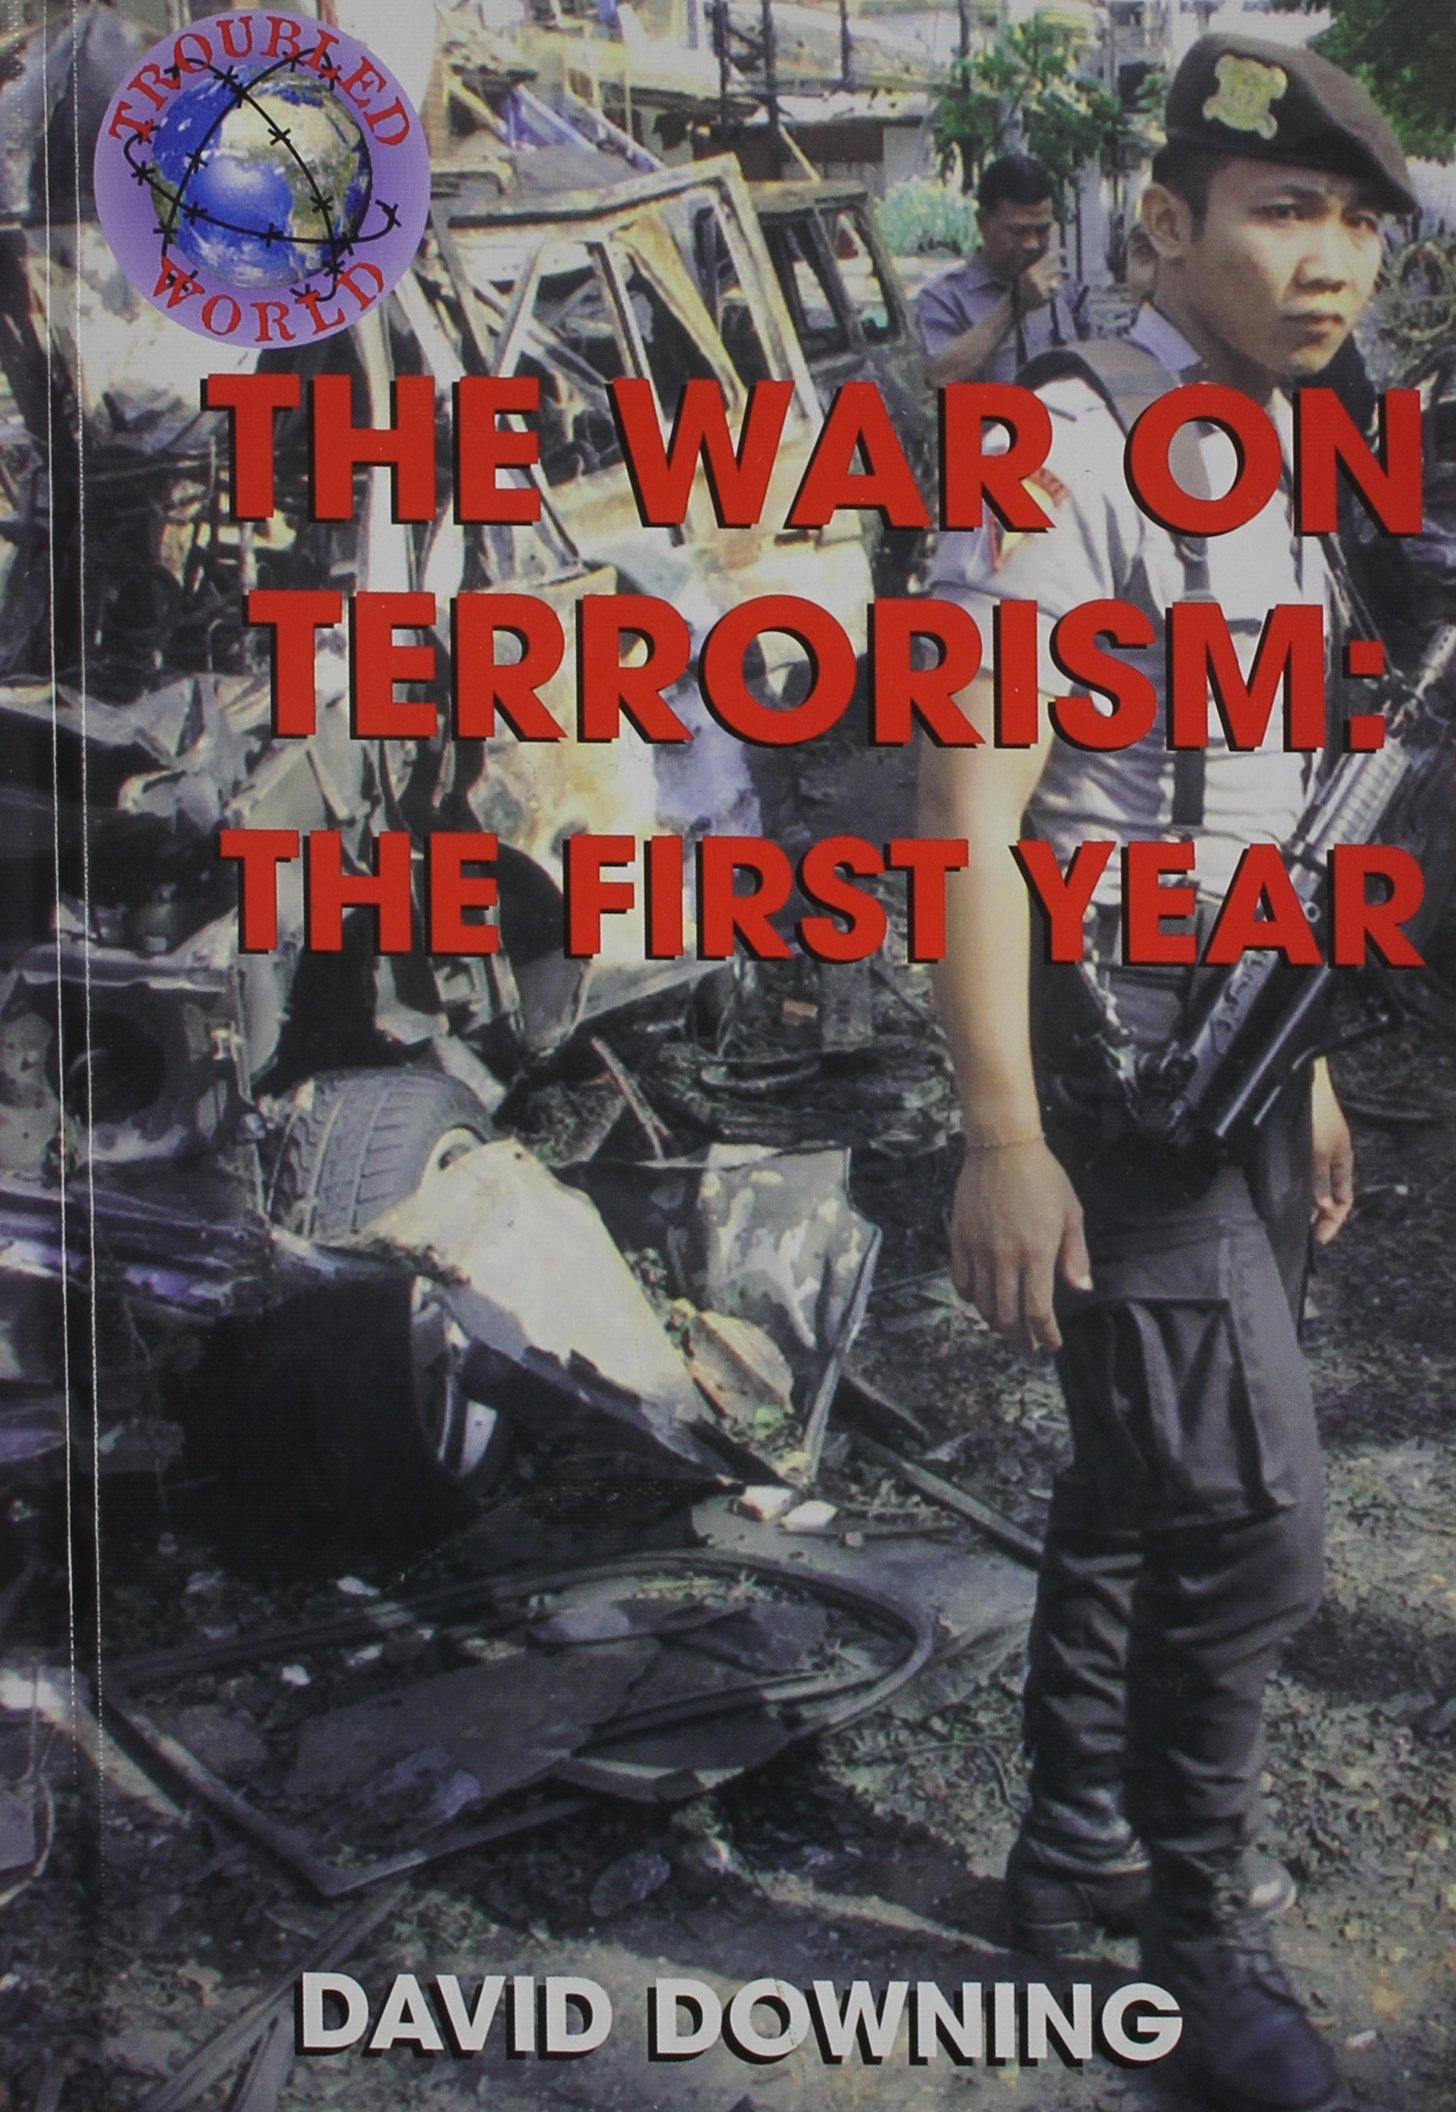 Download War on Terrorism: First Year, the (Troubled World) pdf epub